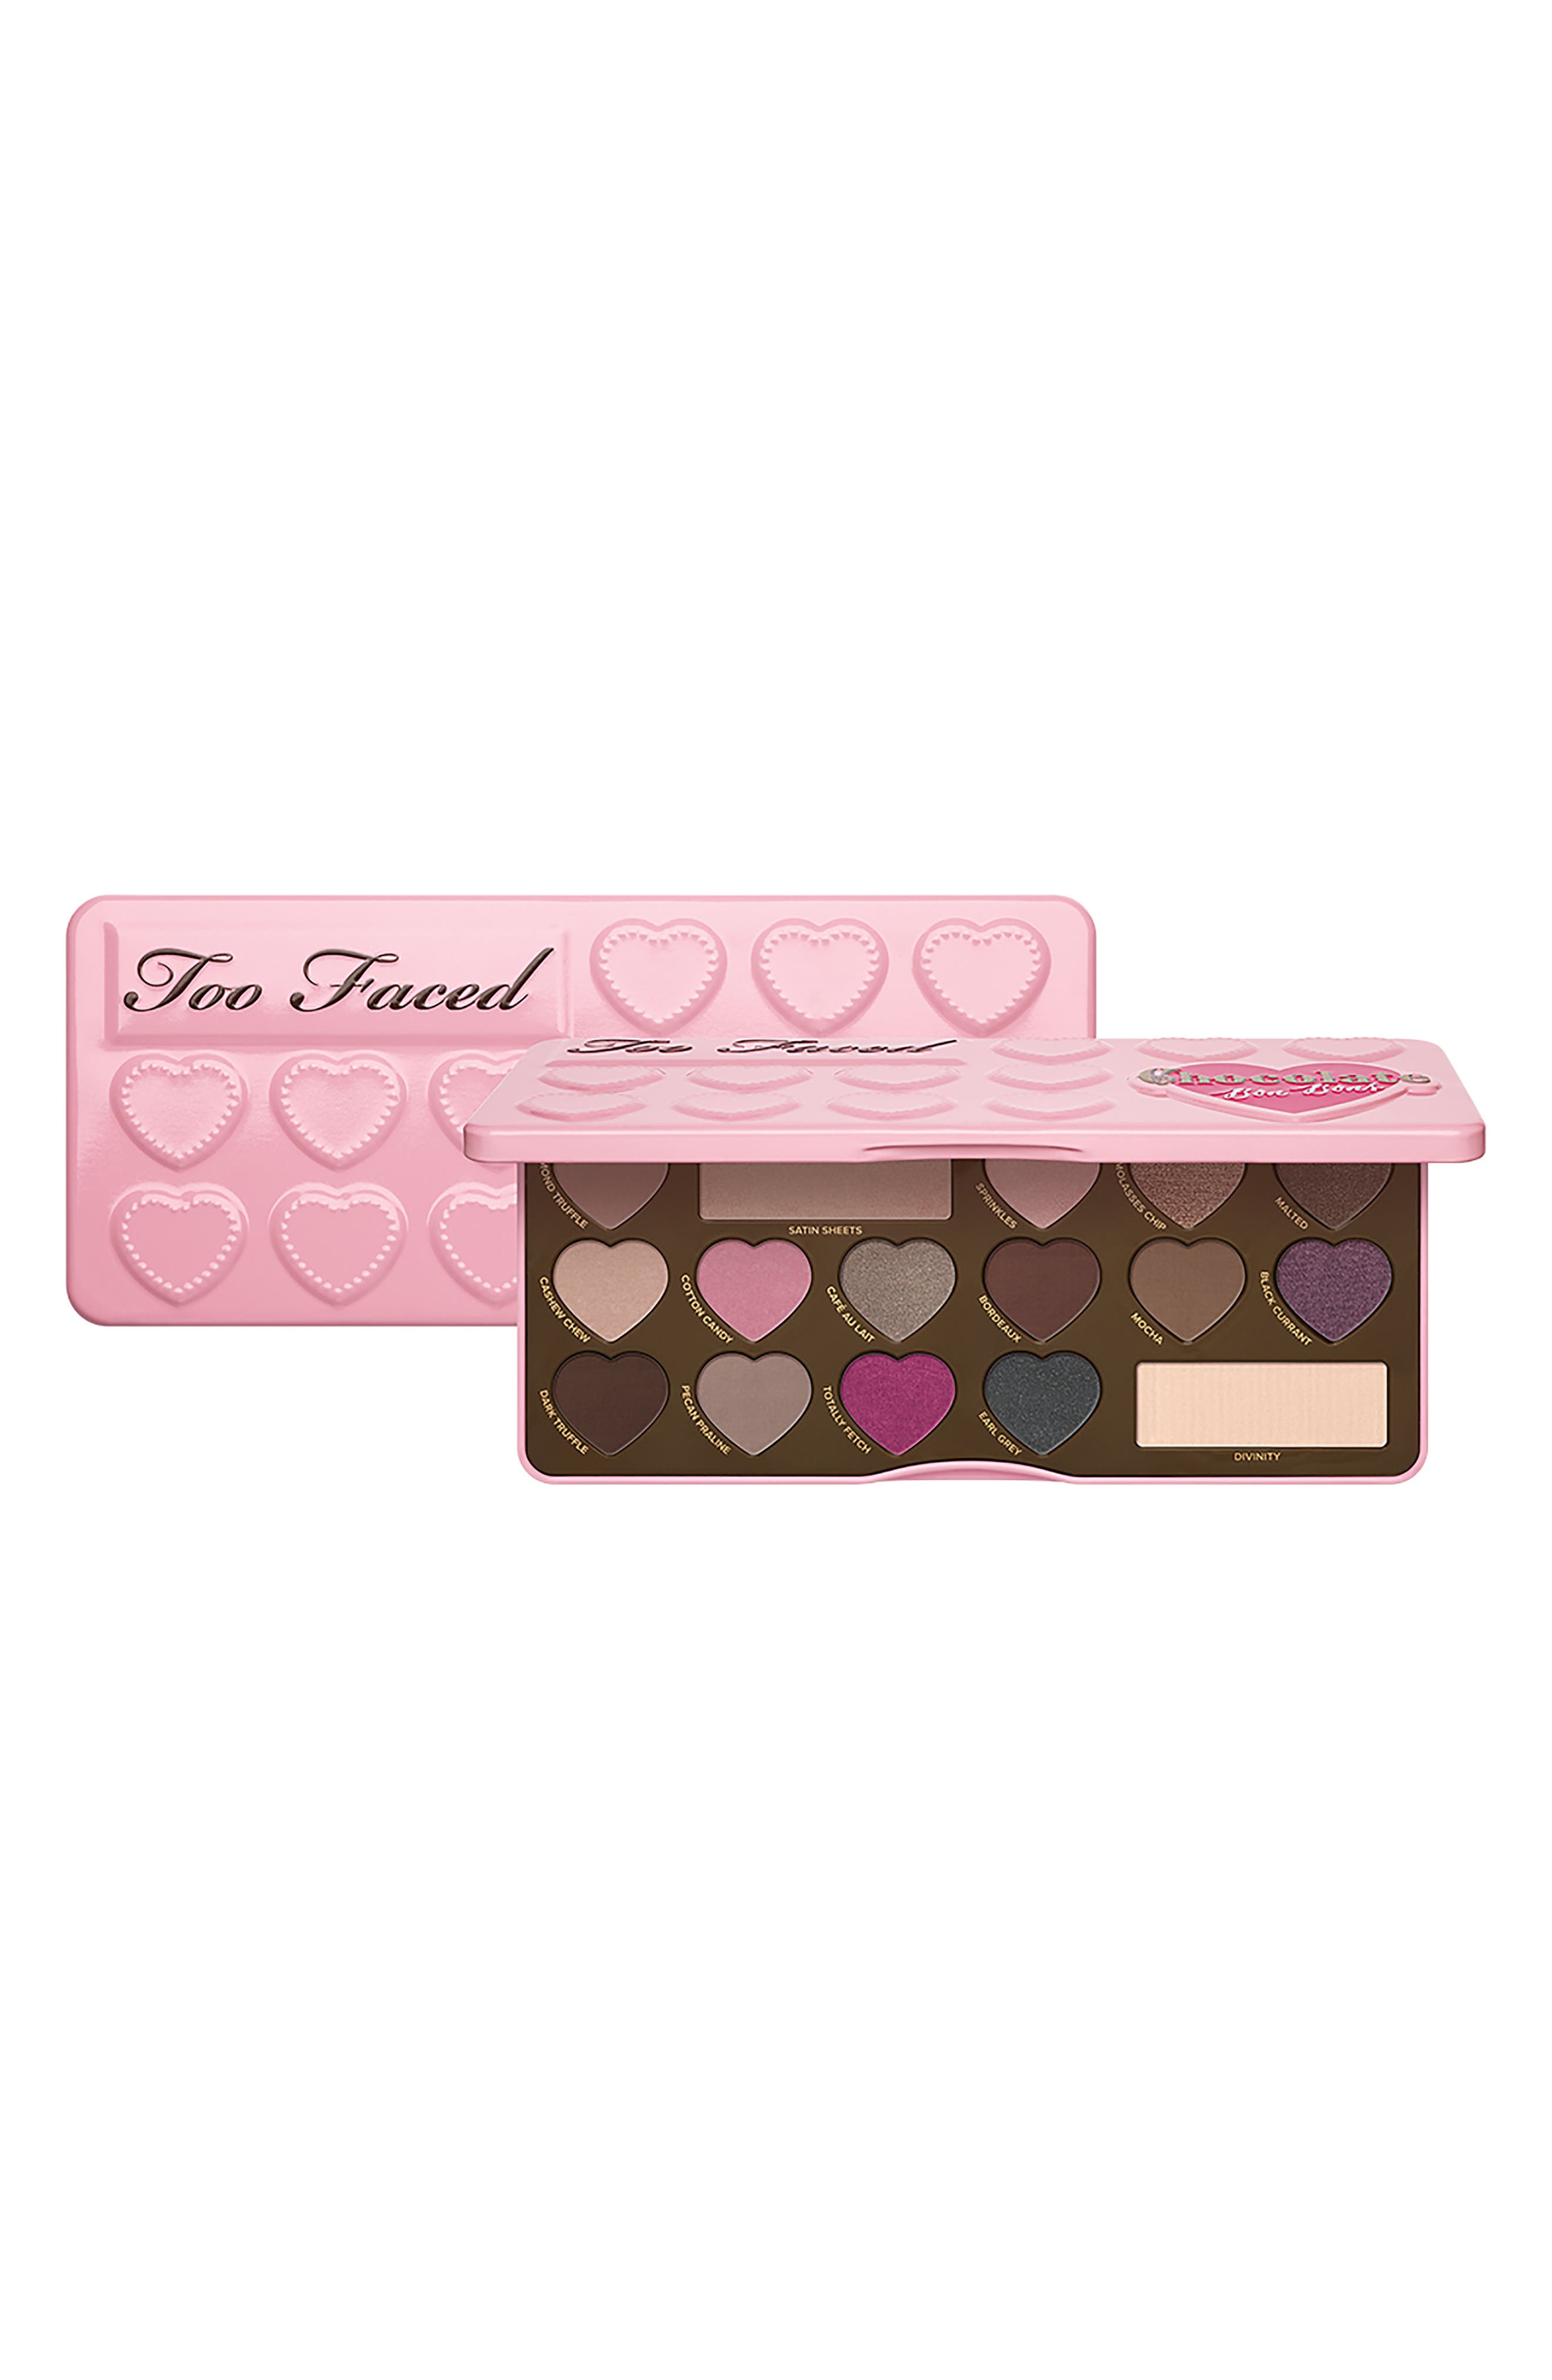 Chocolate Bon Bons Eyeshadow Palette,                             Alternate thumbnail 6, color,                             No Color